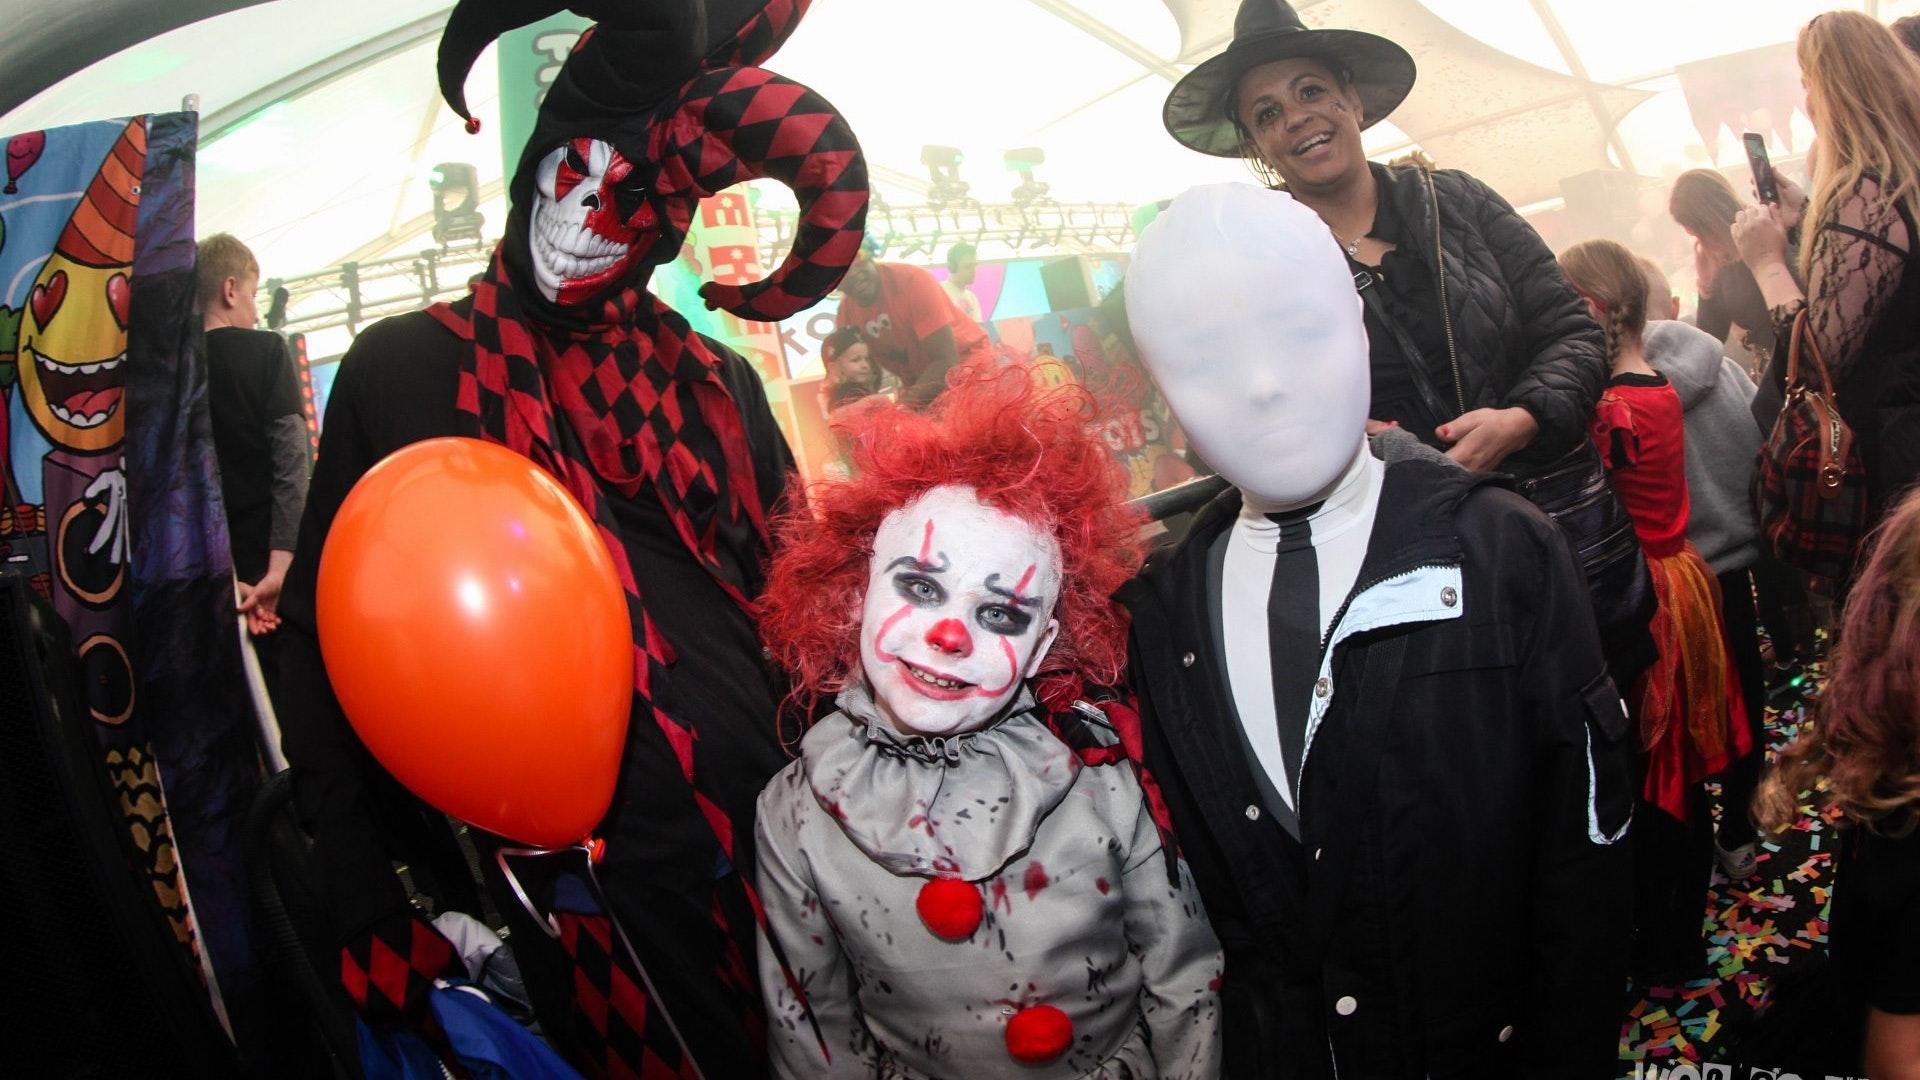 Raver Tots Halloween Family Party London